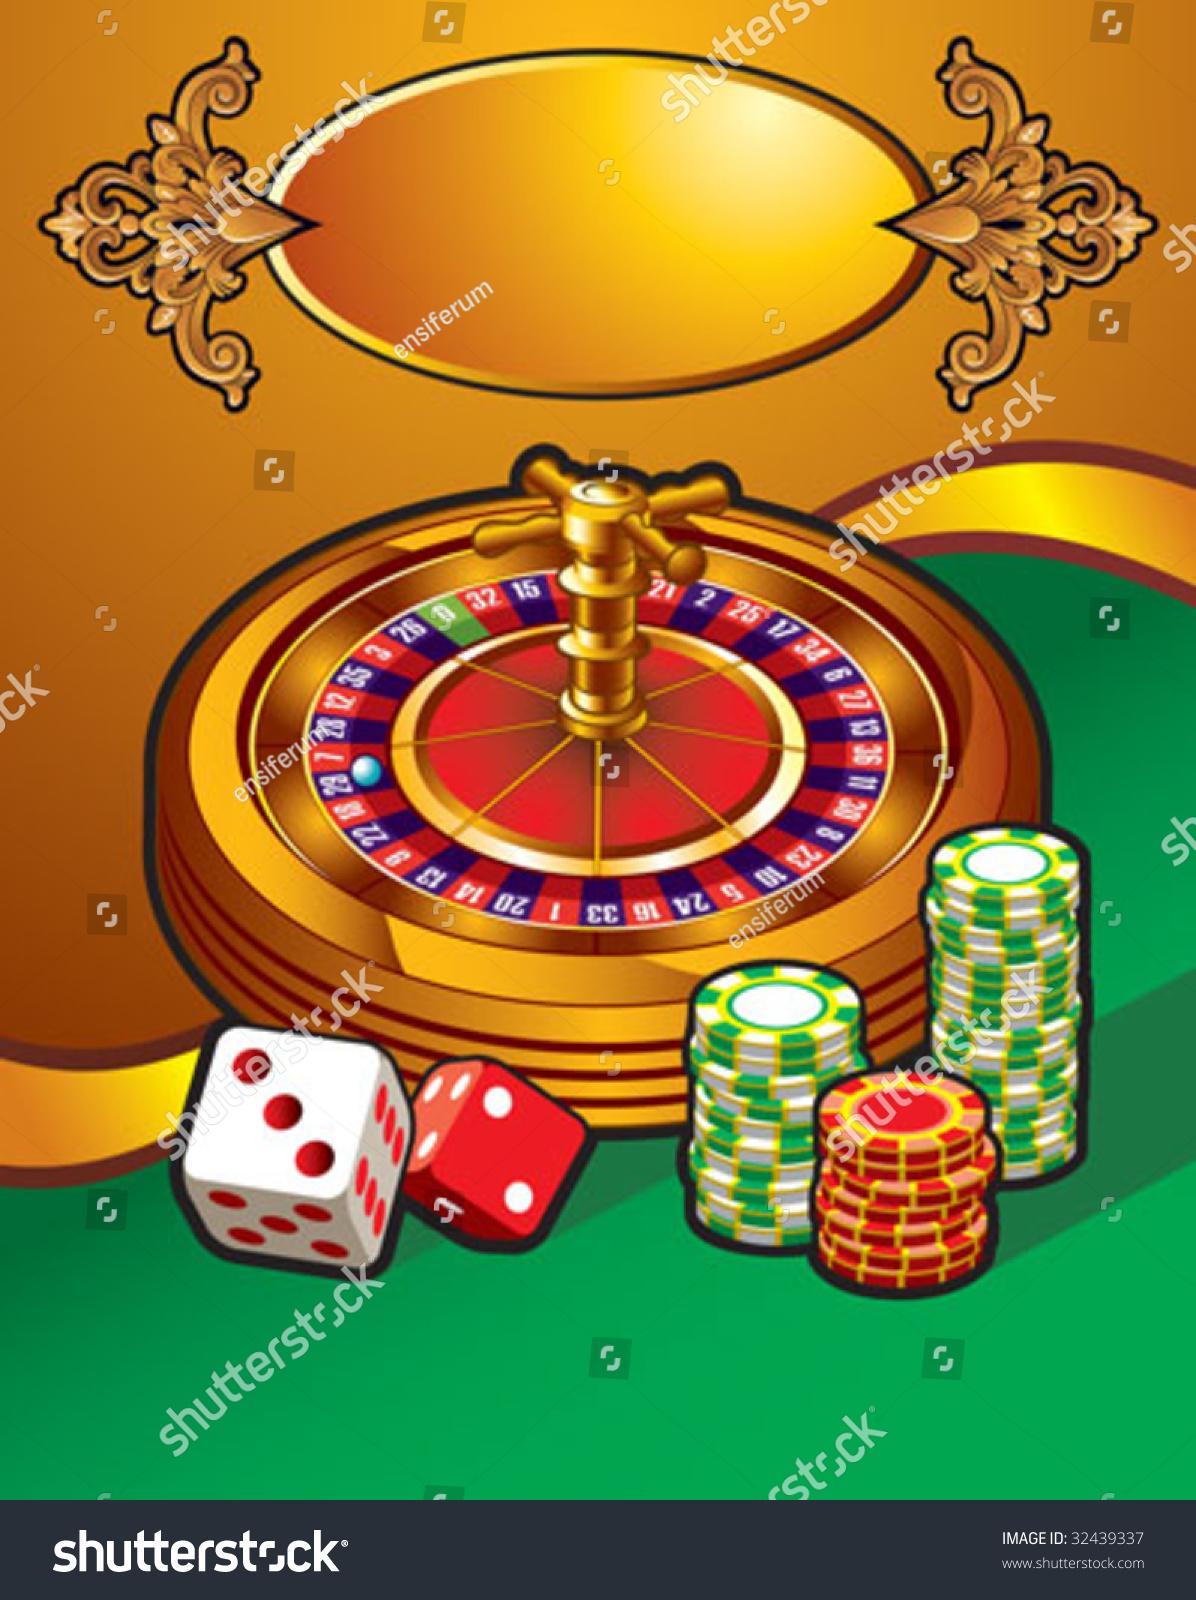 august 20 sycun casino millionaire show